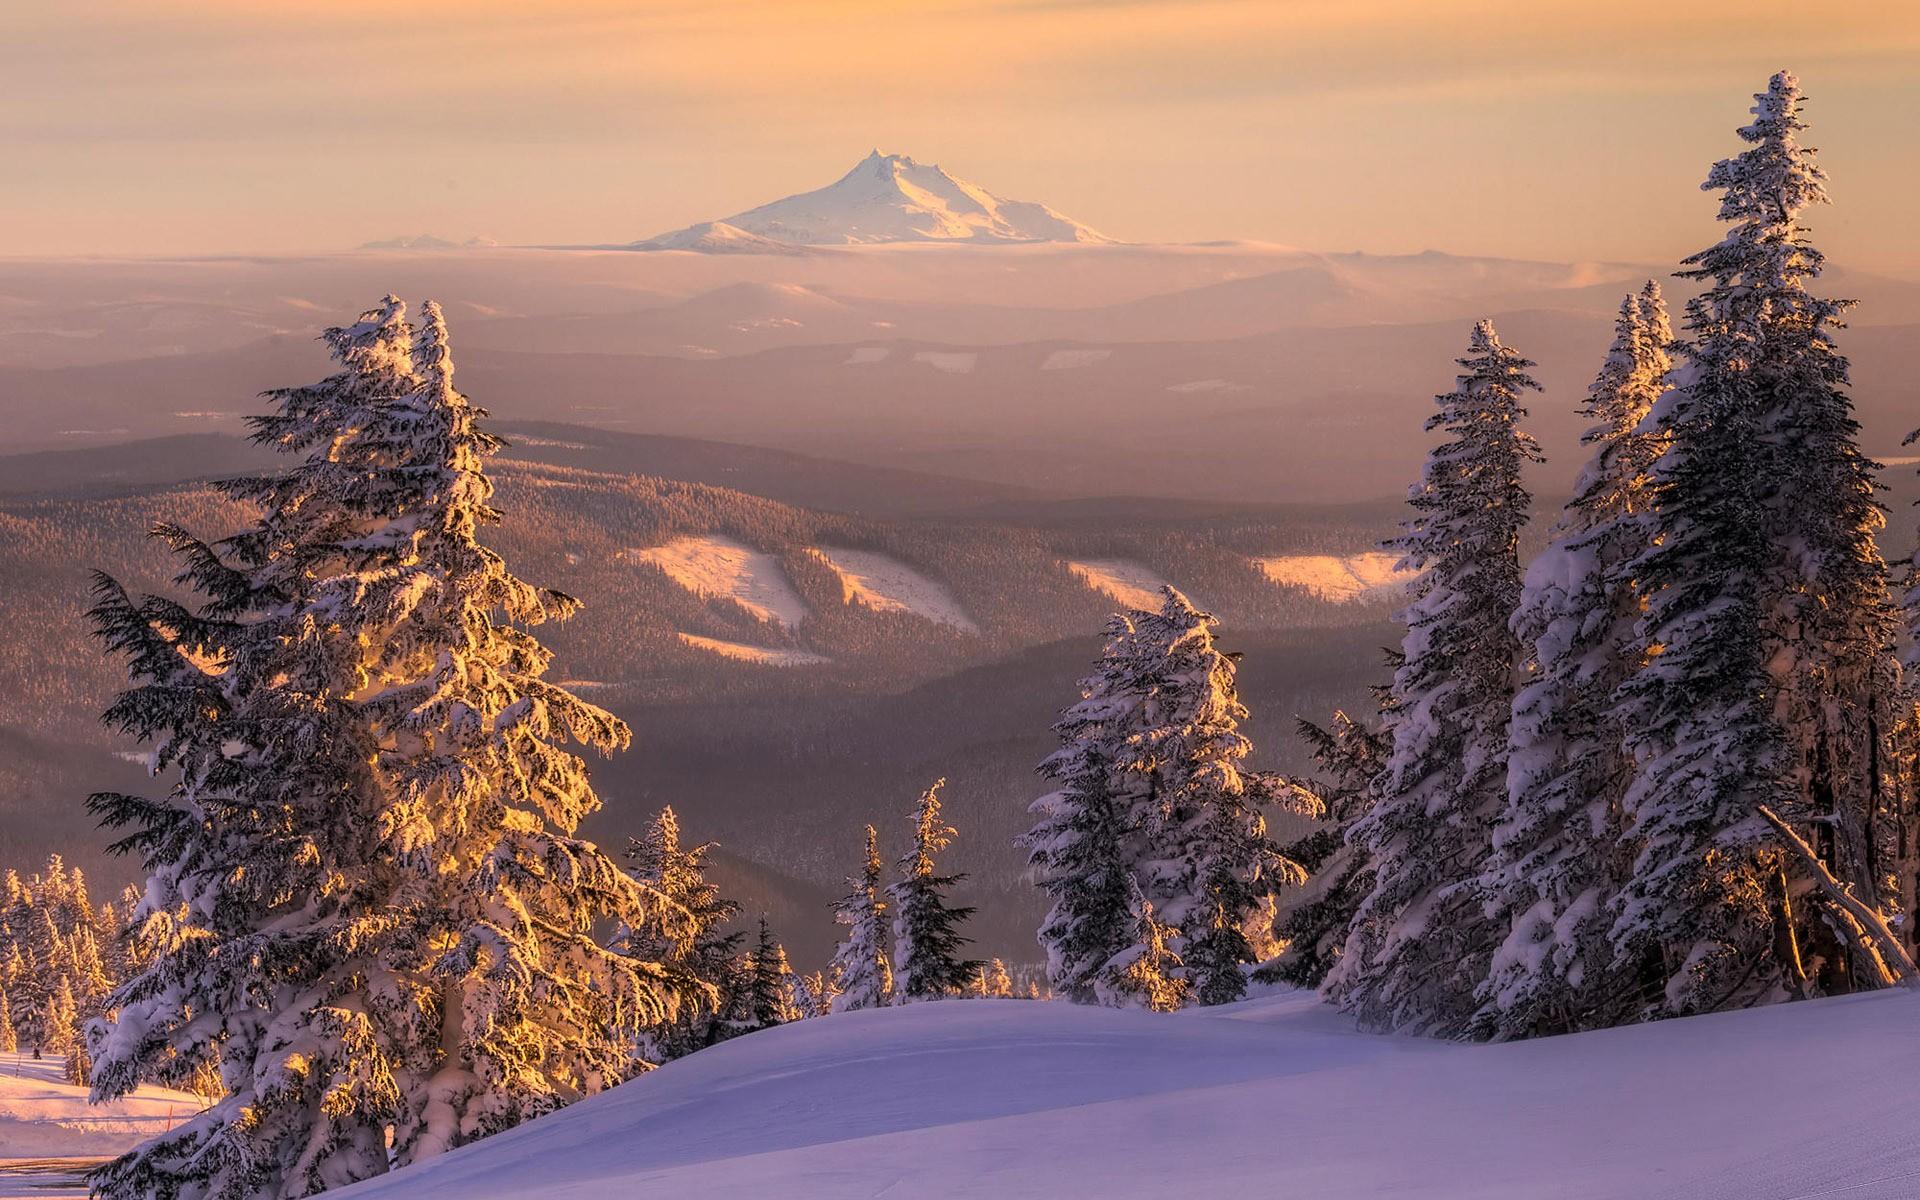 Sunset mountains landscapes nature winter snow trees for Sfondi invernali per desktop gratis